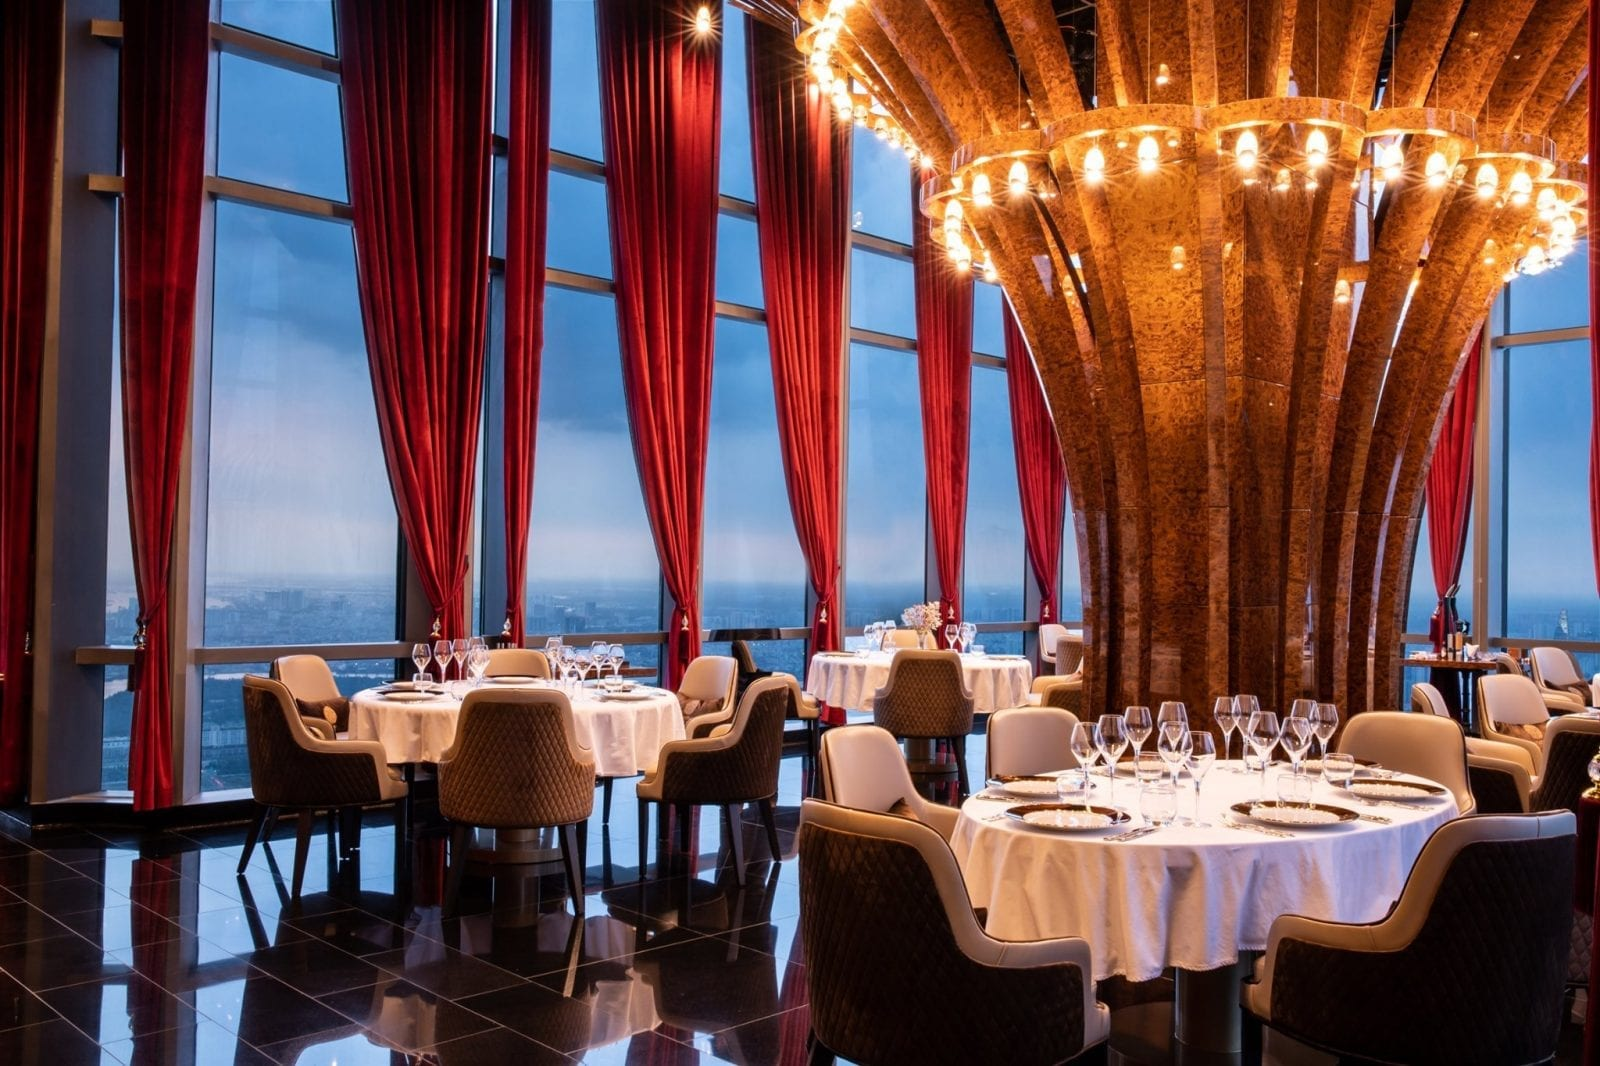 Image of the interior of the Truffle Restaurant in Landmark 81